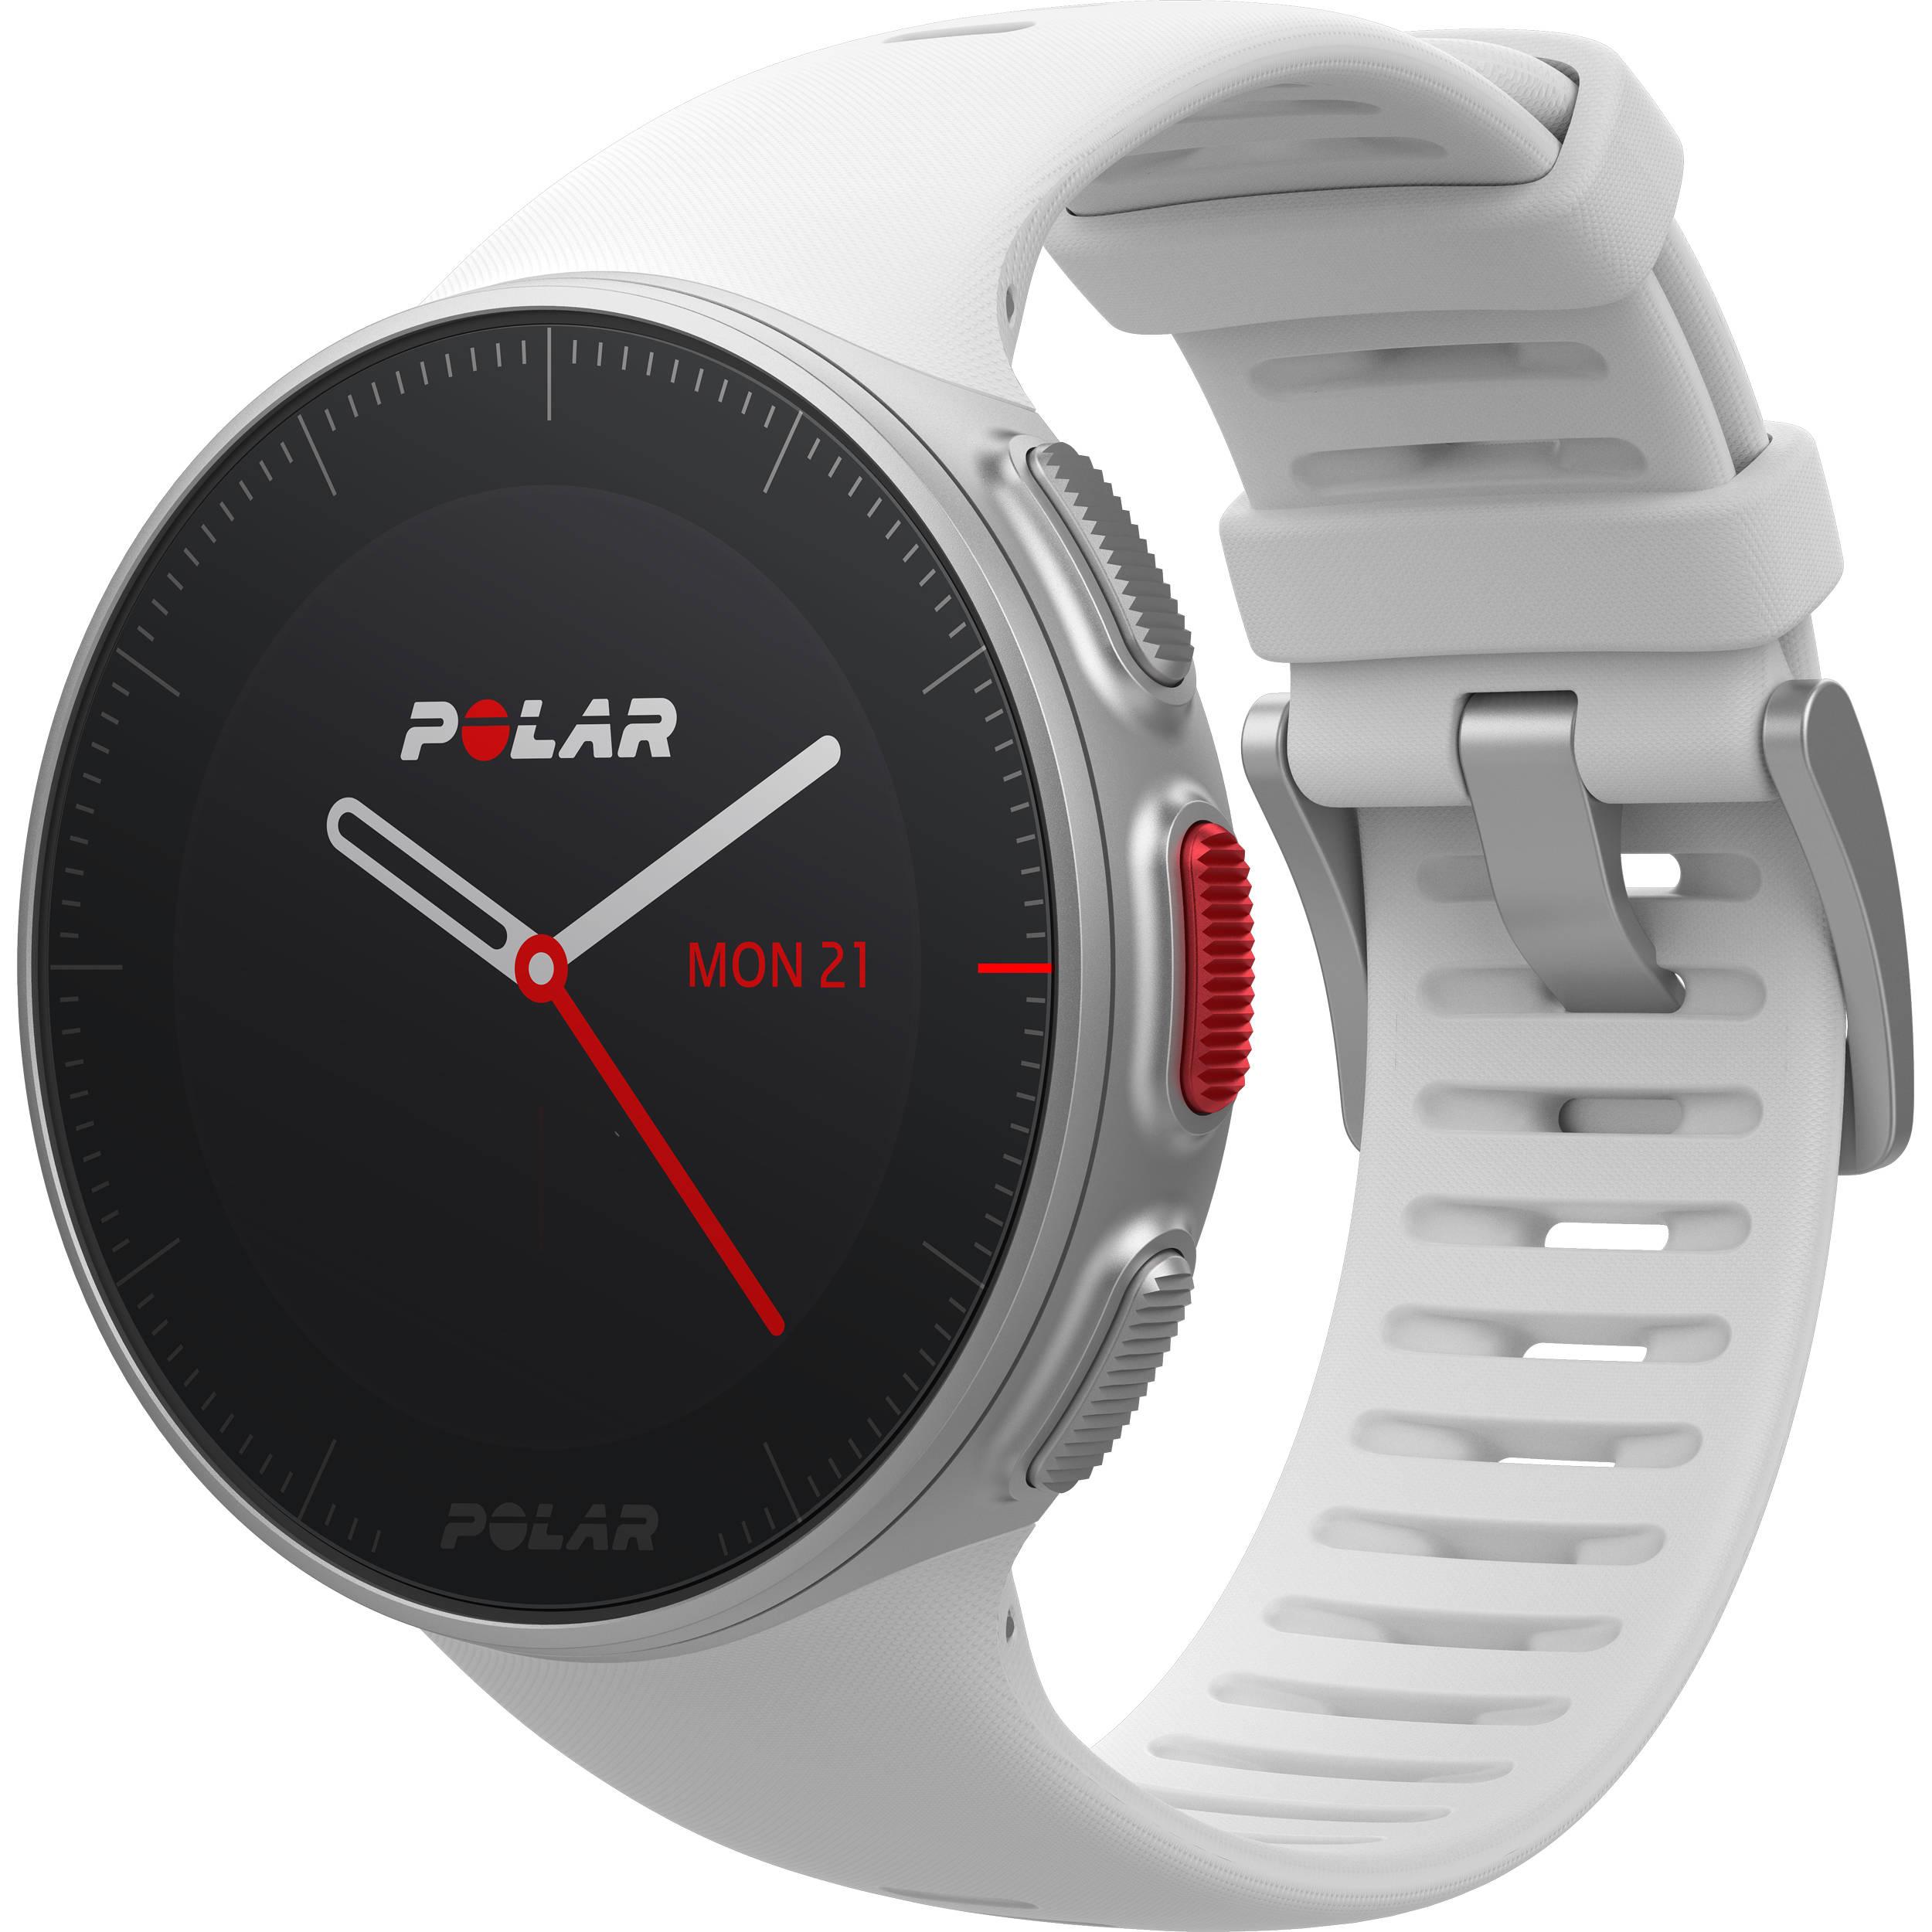 0678286a1b1 Polar Vantage V Multisport/Triathlon GPS Watch with H10 Heart Rate Sensor  (M/